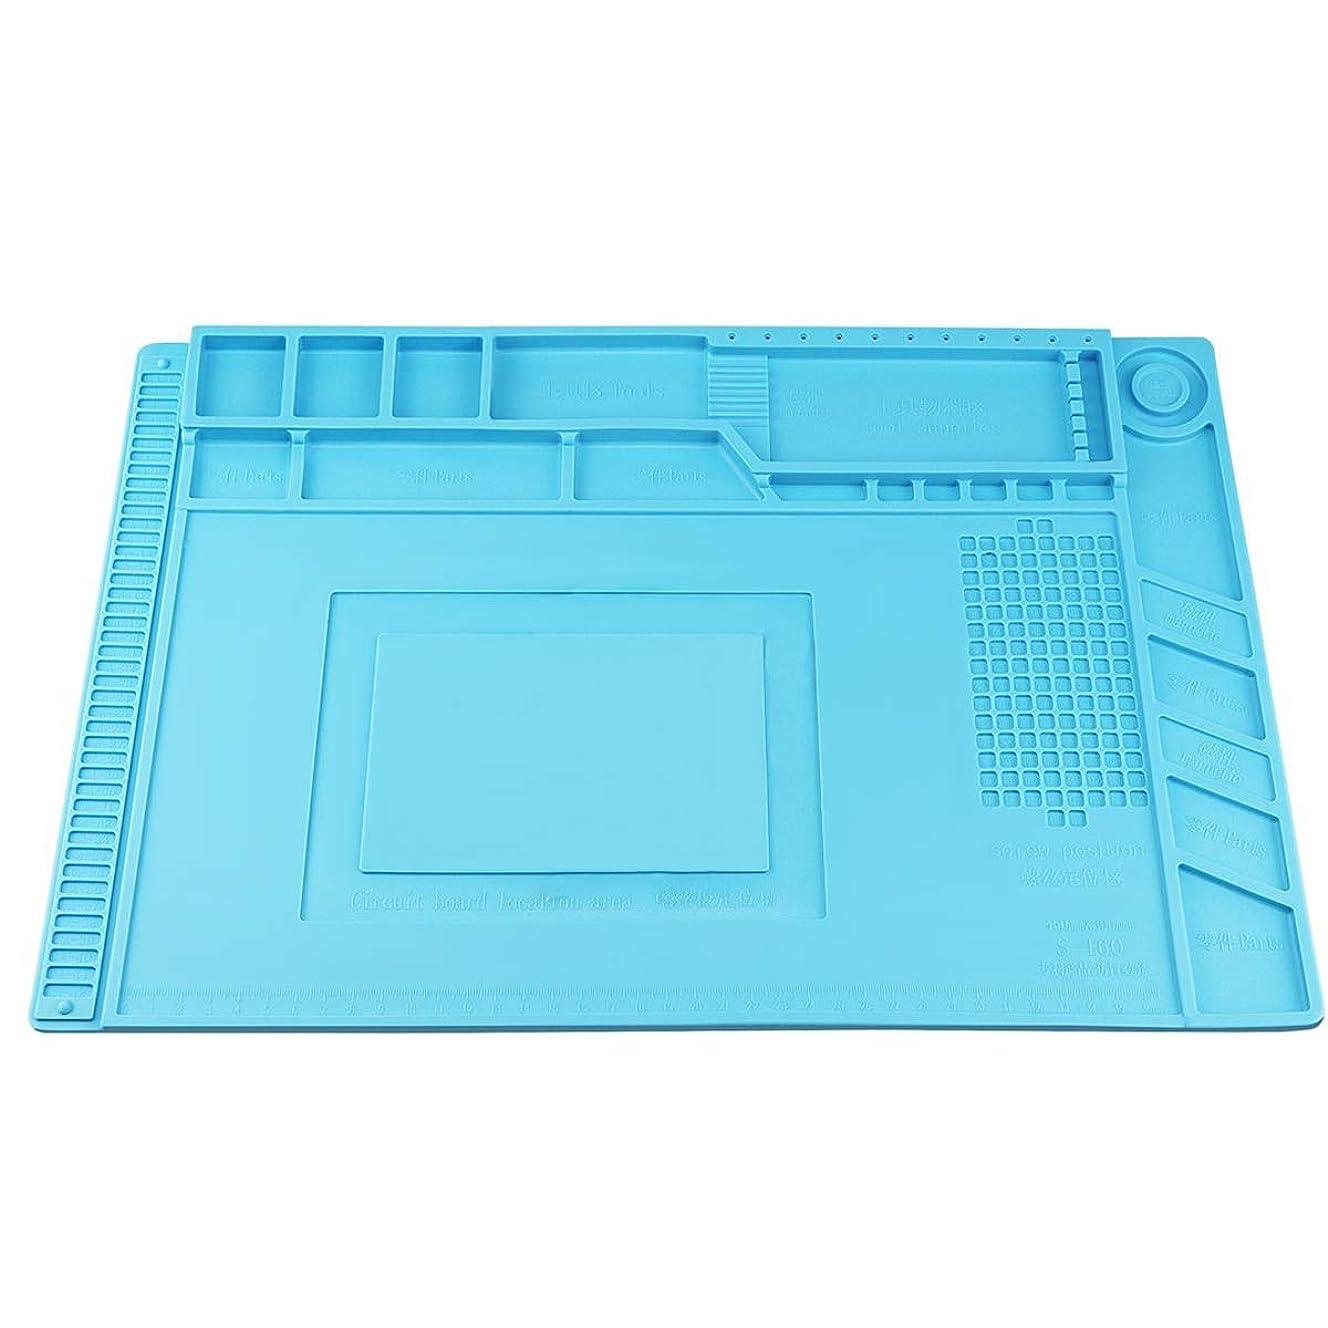 Heat Insulation Silicone Repair Mat, Large Silicone Repair Mat for Soldering Iron, Phone and Computer Repair, Heat Gun, Electronics Repair Disassembly (17.79''11.69'') - Blue